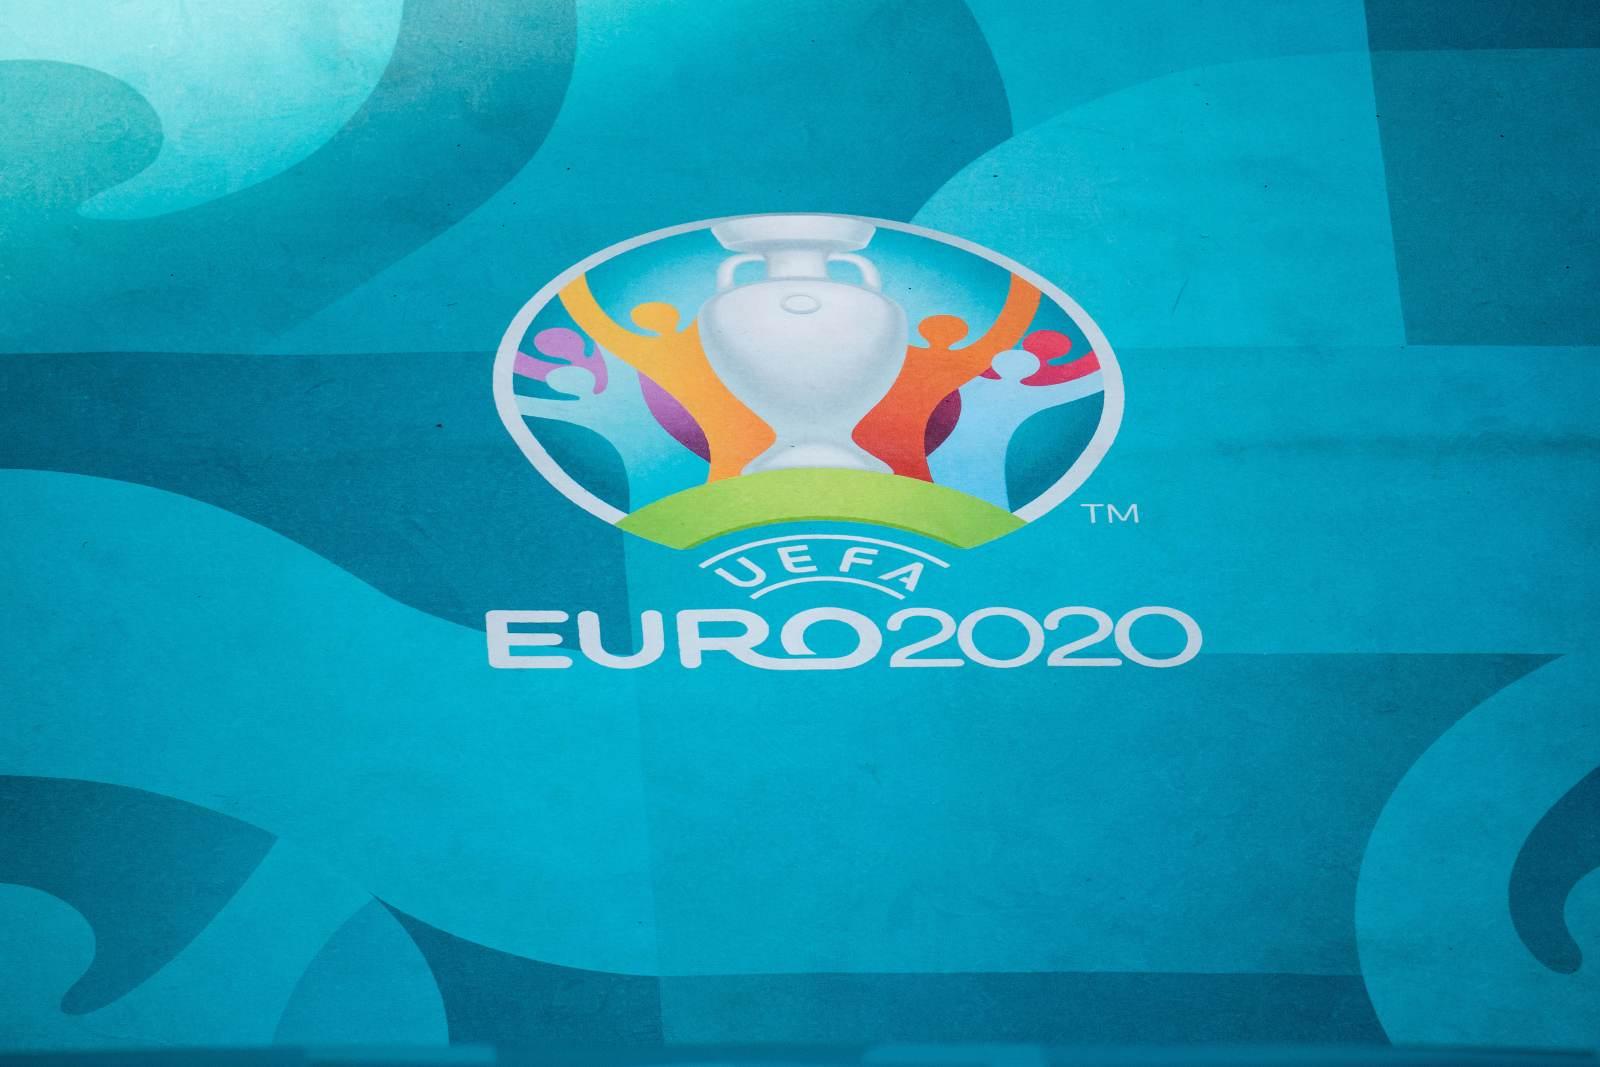 УЕФА представил символическую сборную Евро-2020